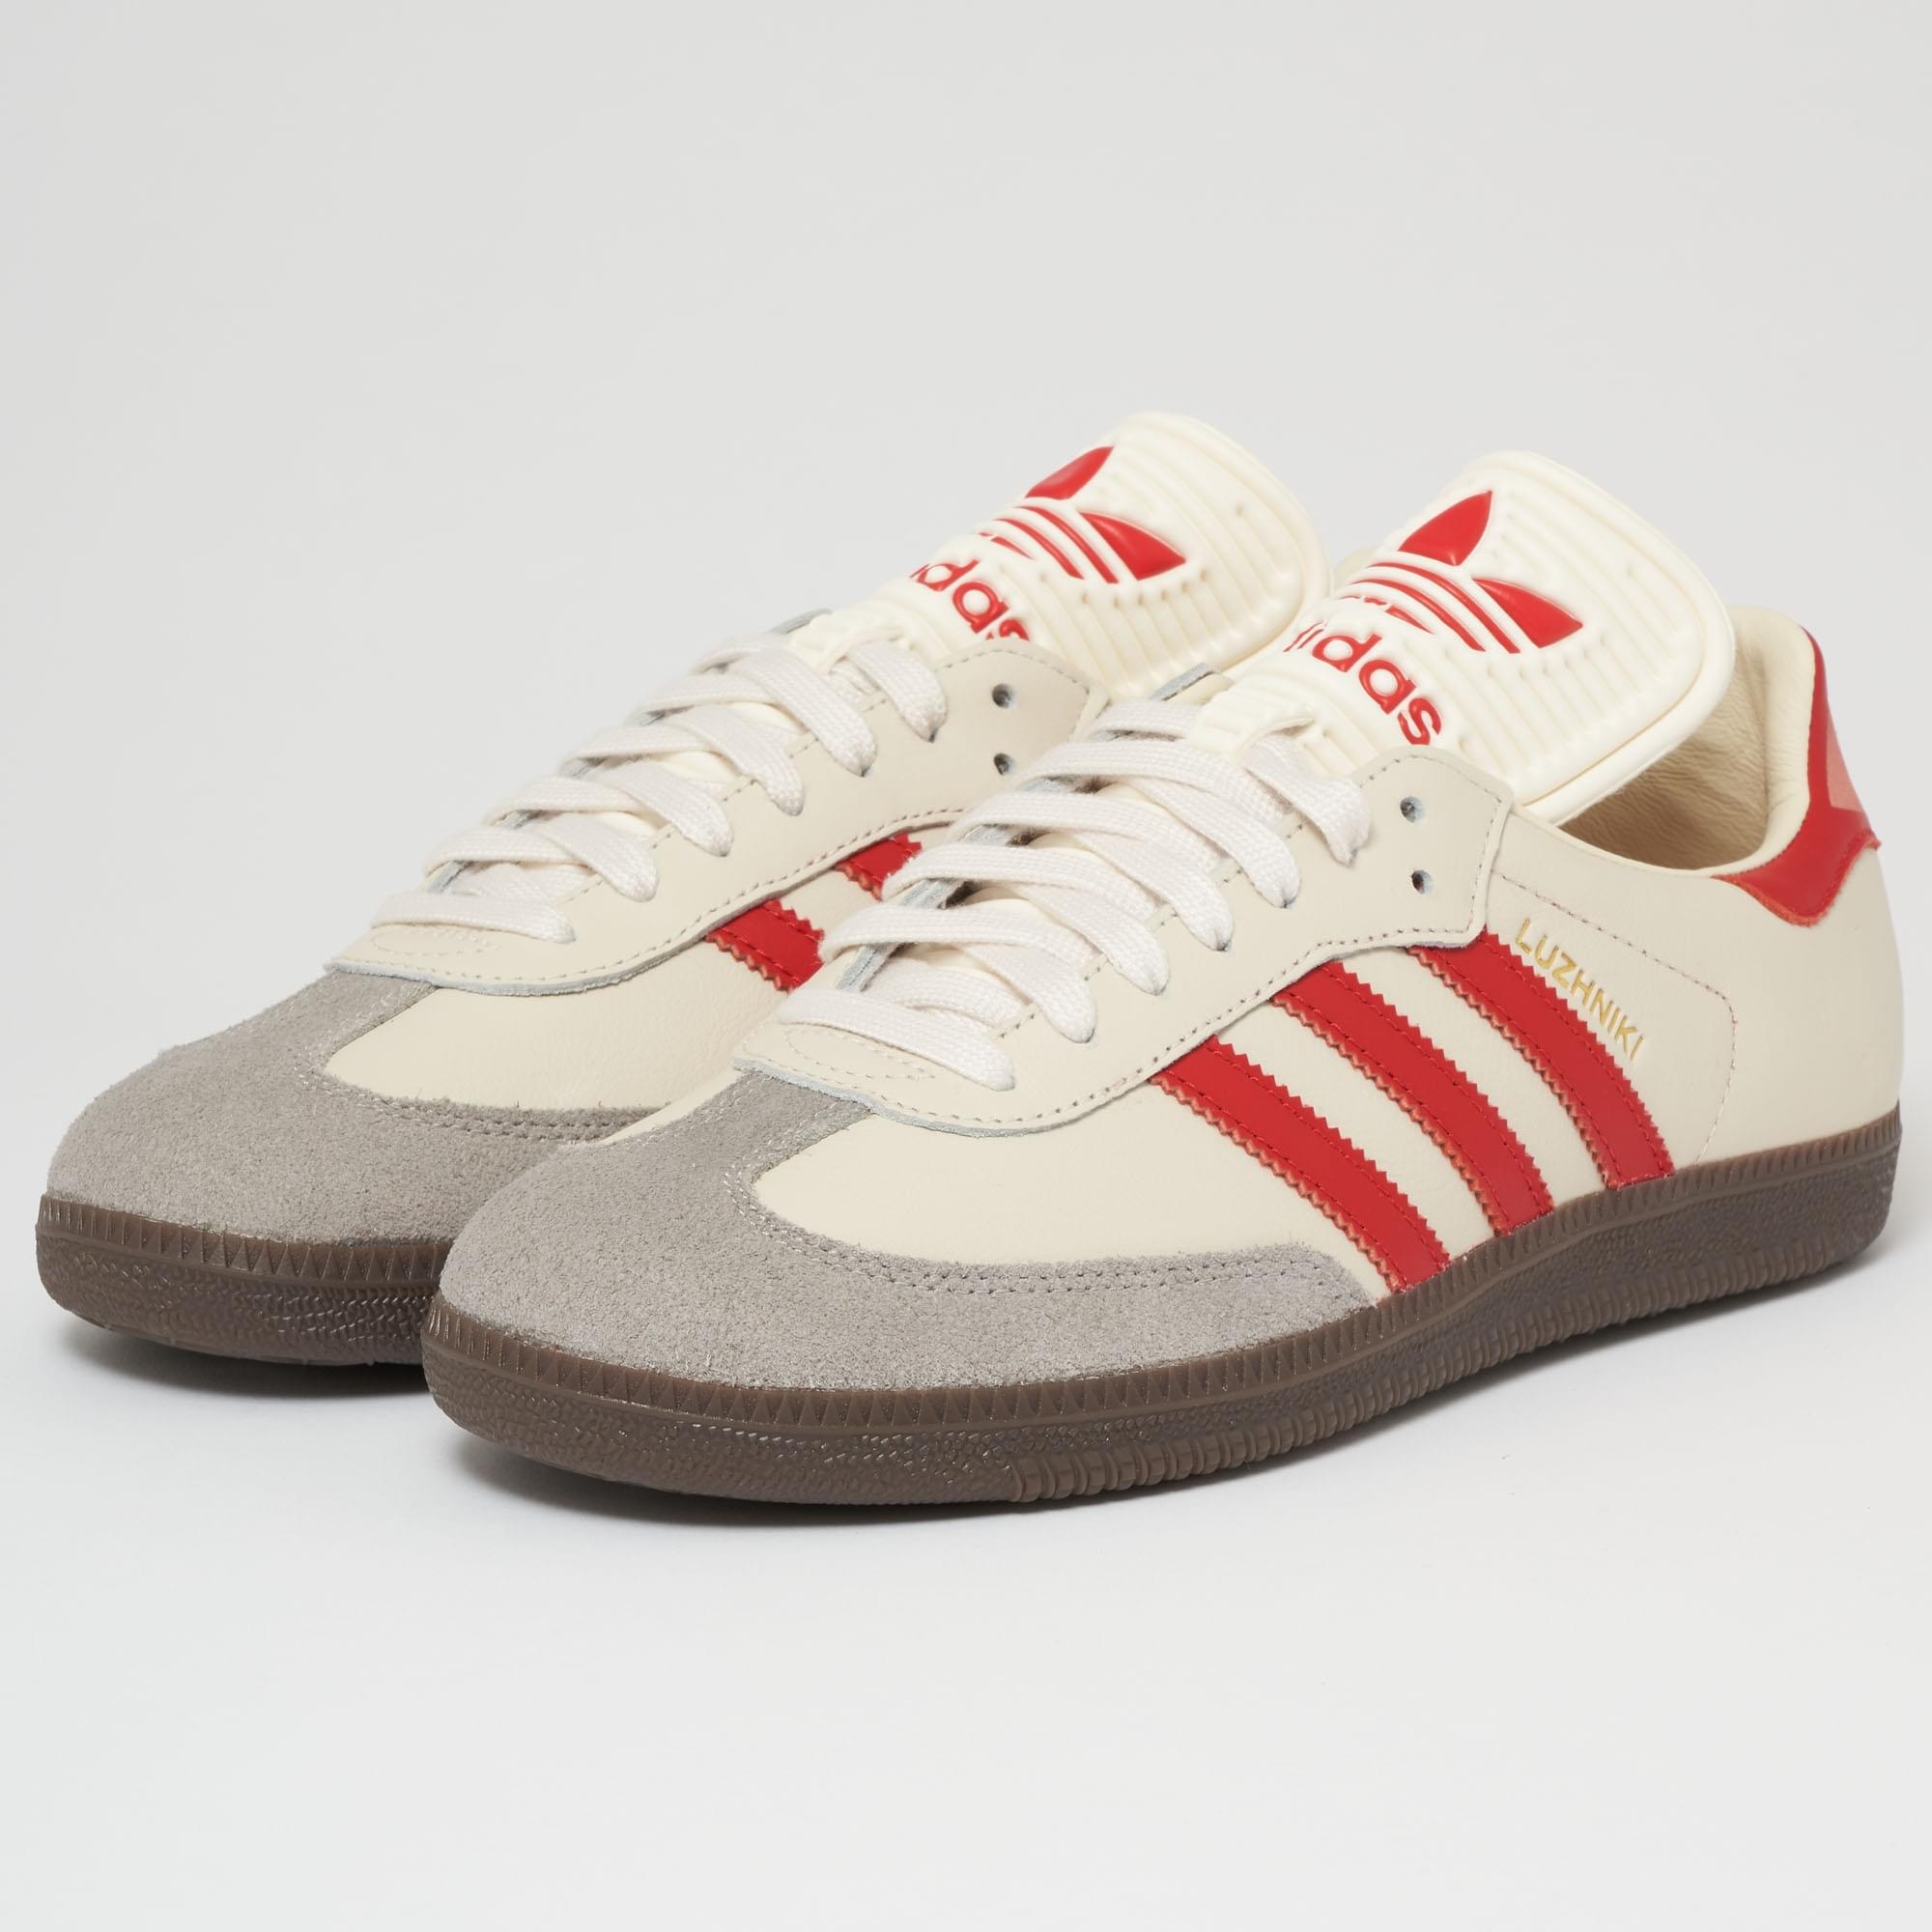 Lyst - adidas Originals Samba Classic Og  luzhniki Stadium Pack ... db9046f64